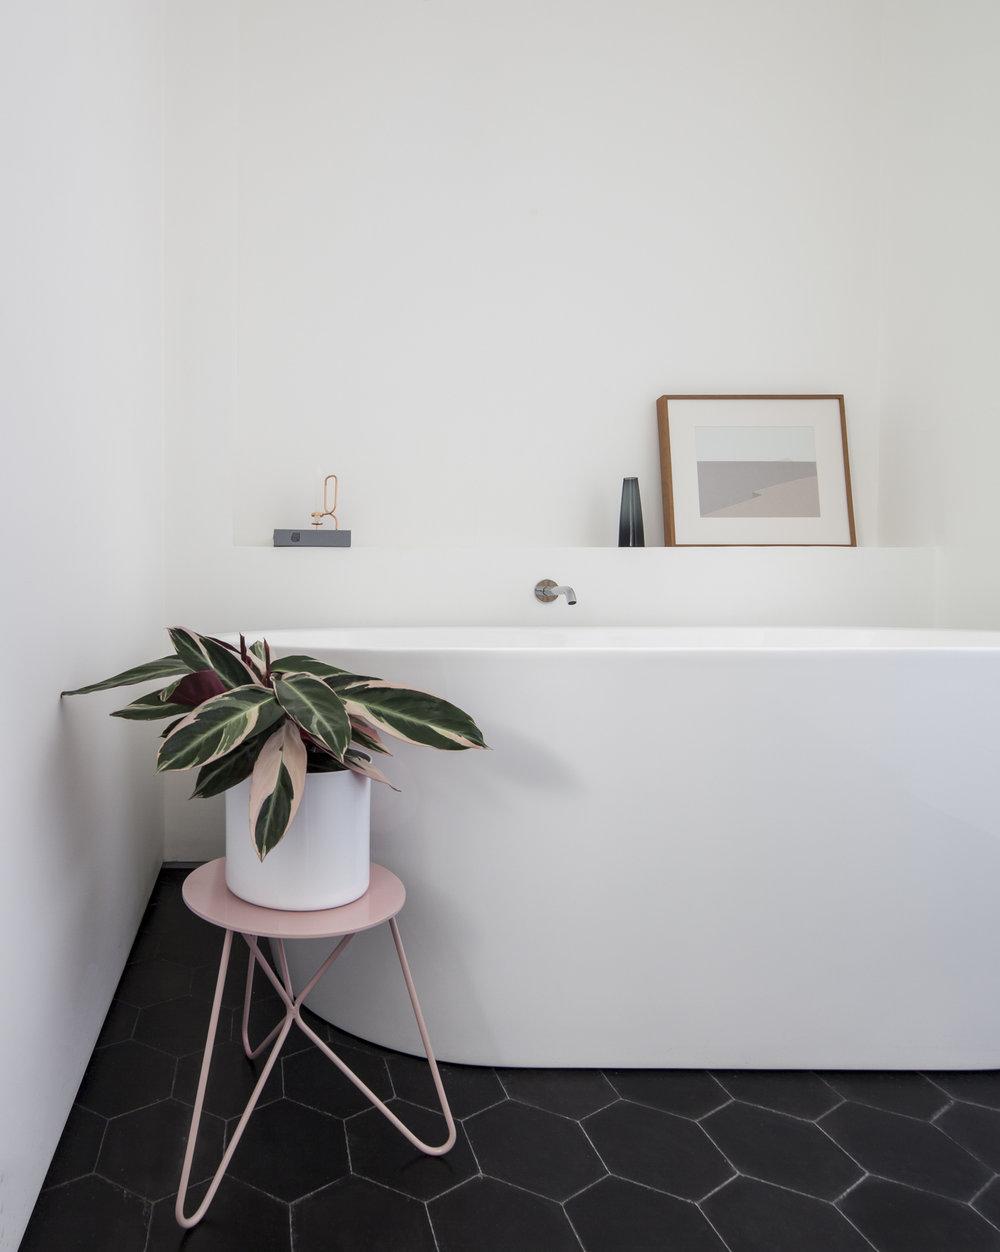 banhos rb - estudio nodo-5.jpg